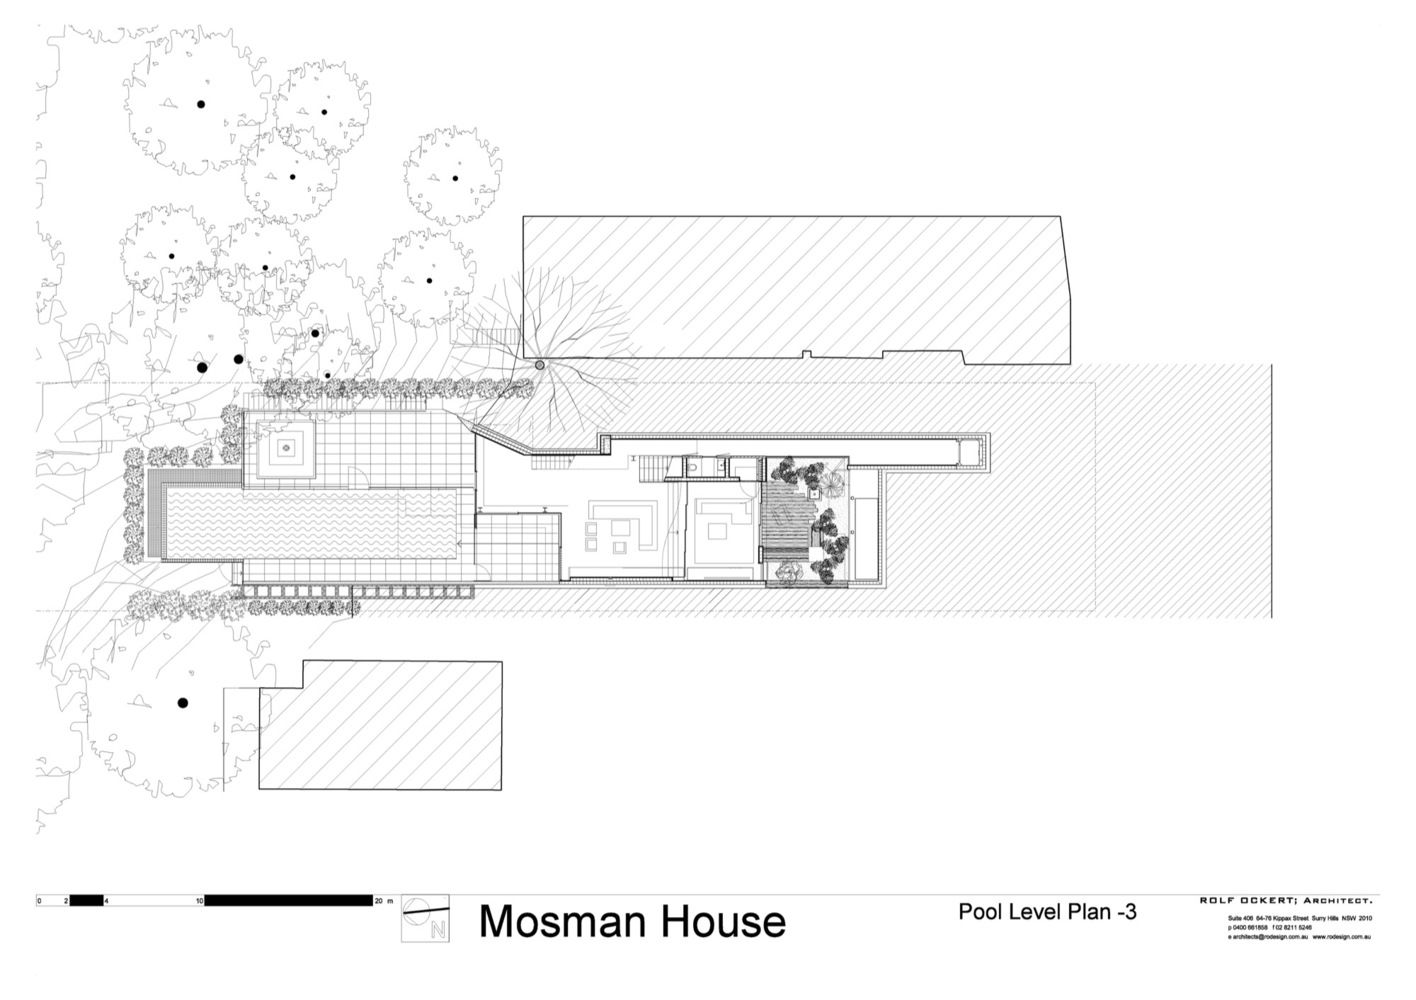 Gallery Of Mosman House Rolf Ockert Architect 38 Architect Site Plan House